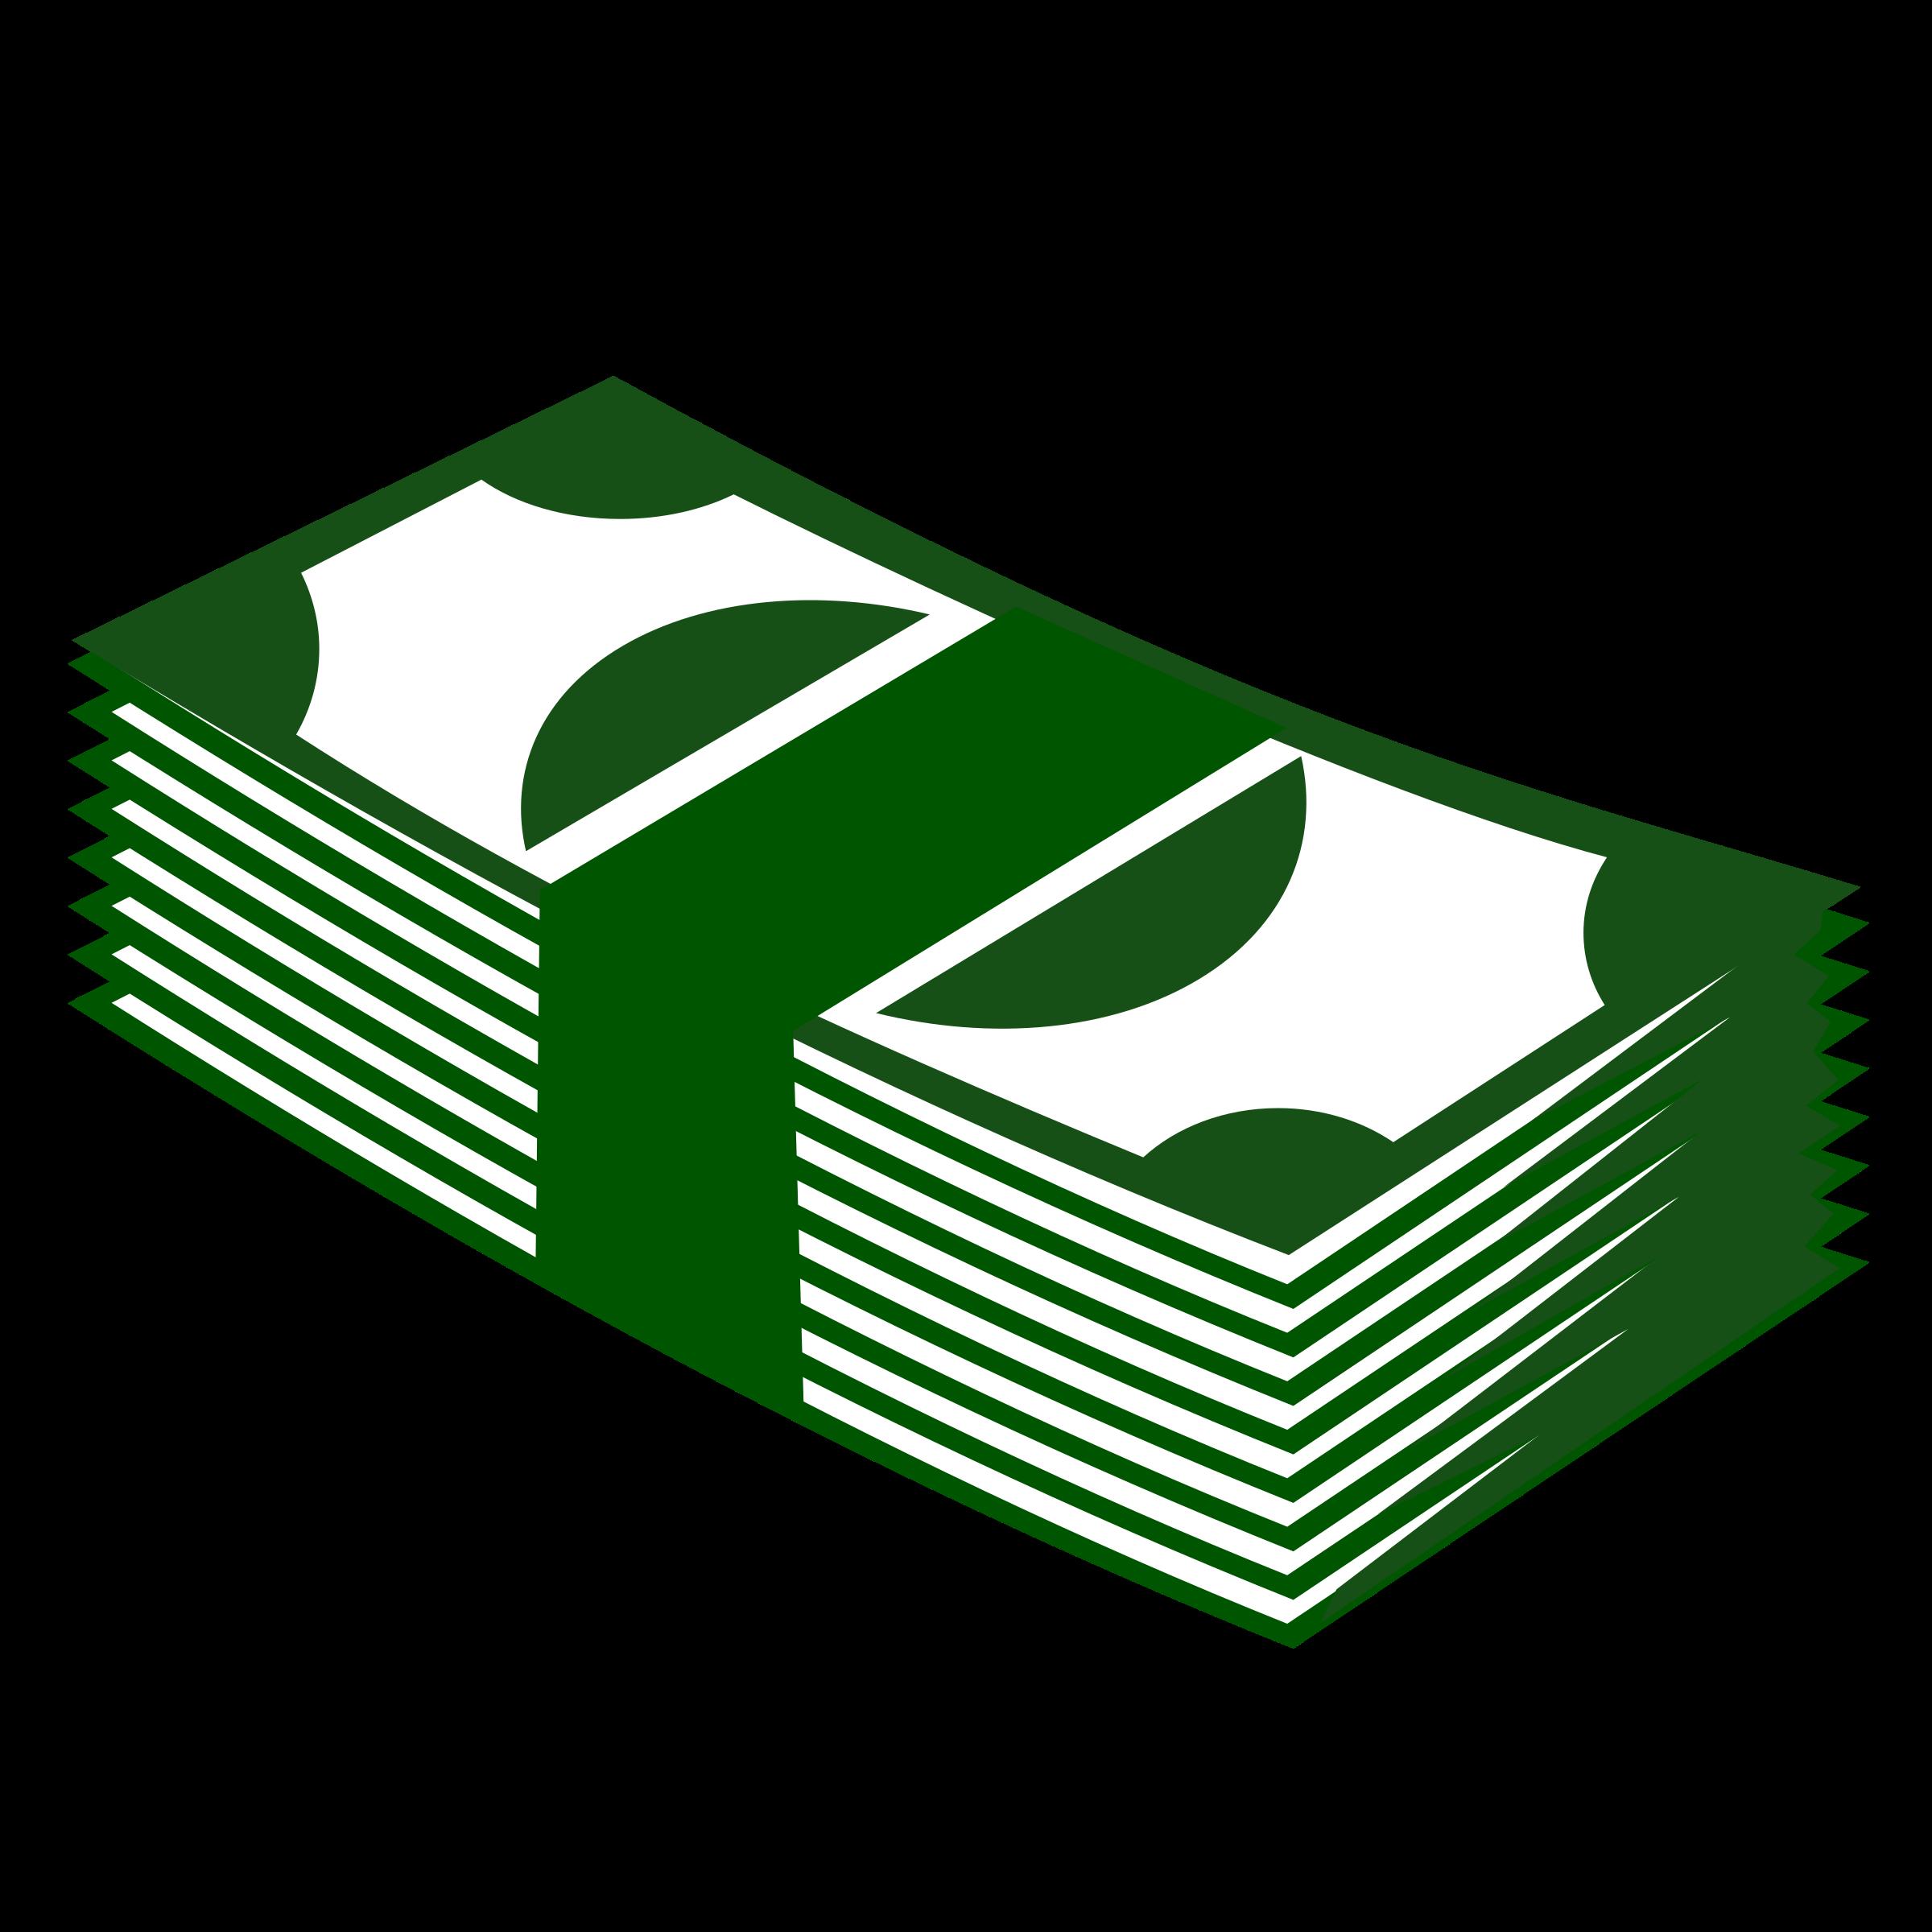 2400x2400 Money Clip Art Free Printable Clipart Images 3